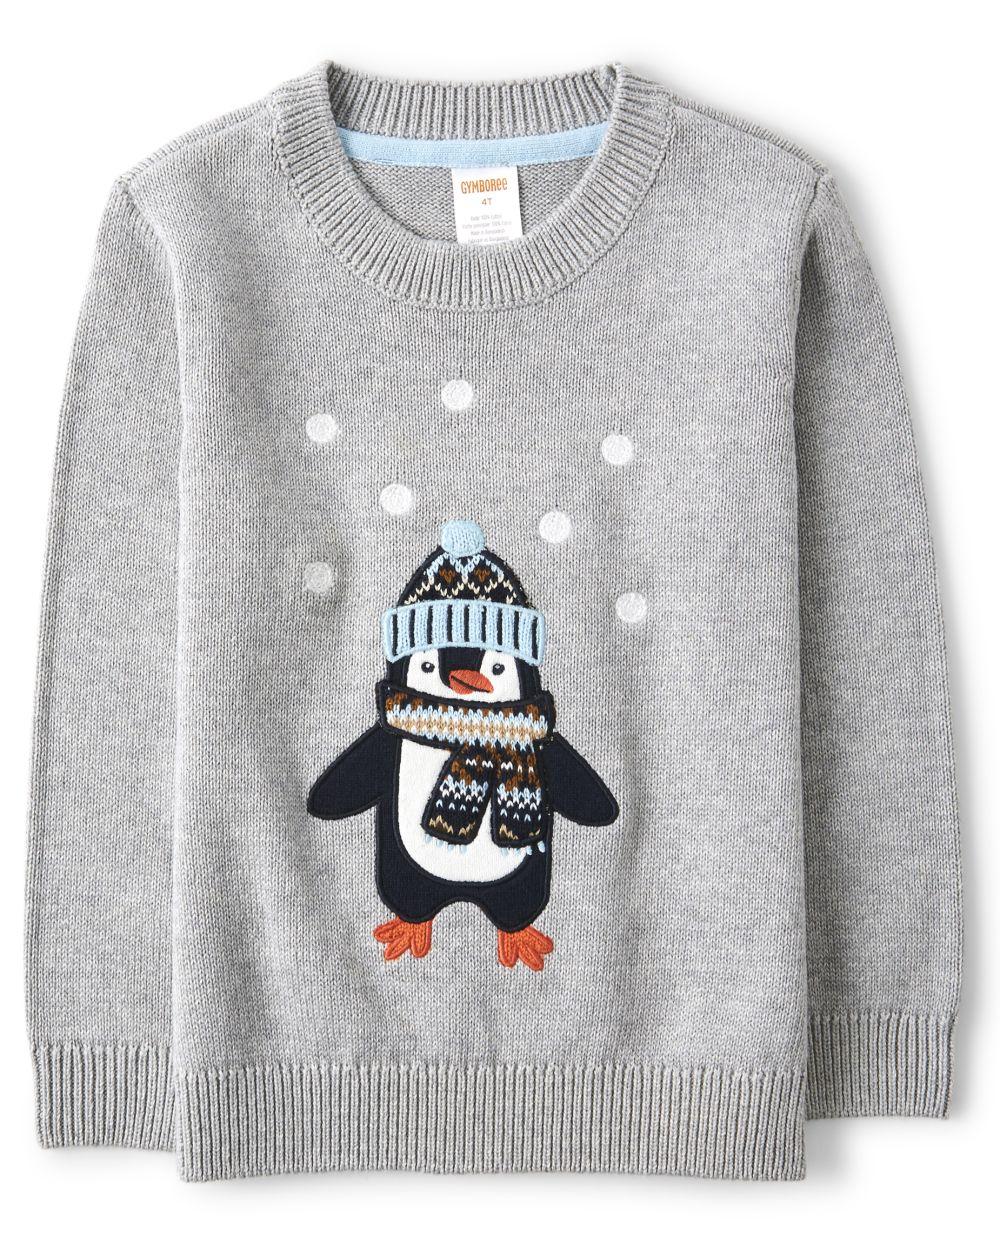 Boys Embroidered Penguin Sweater - Aspen Lodge